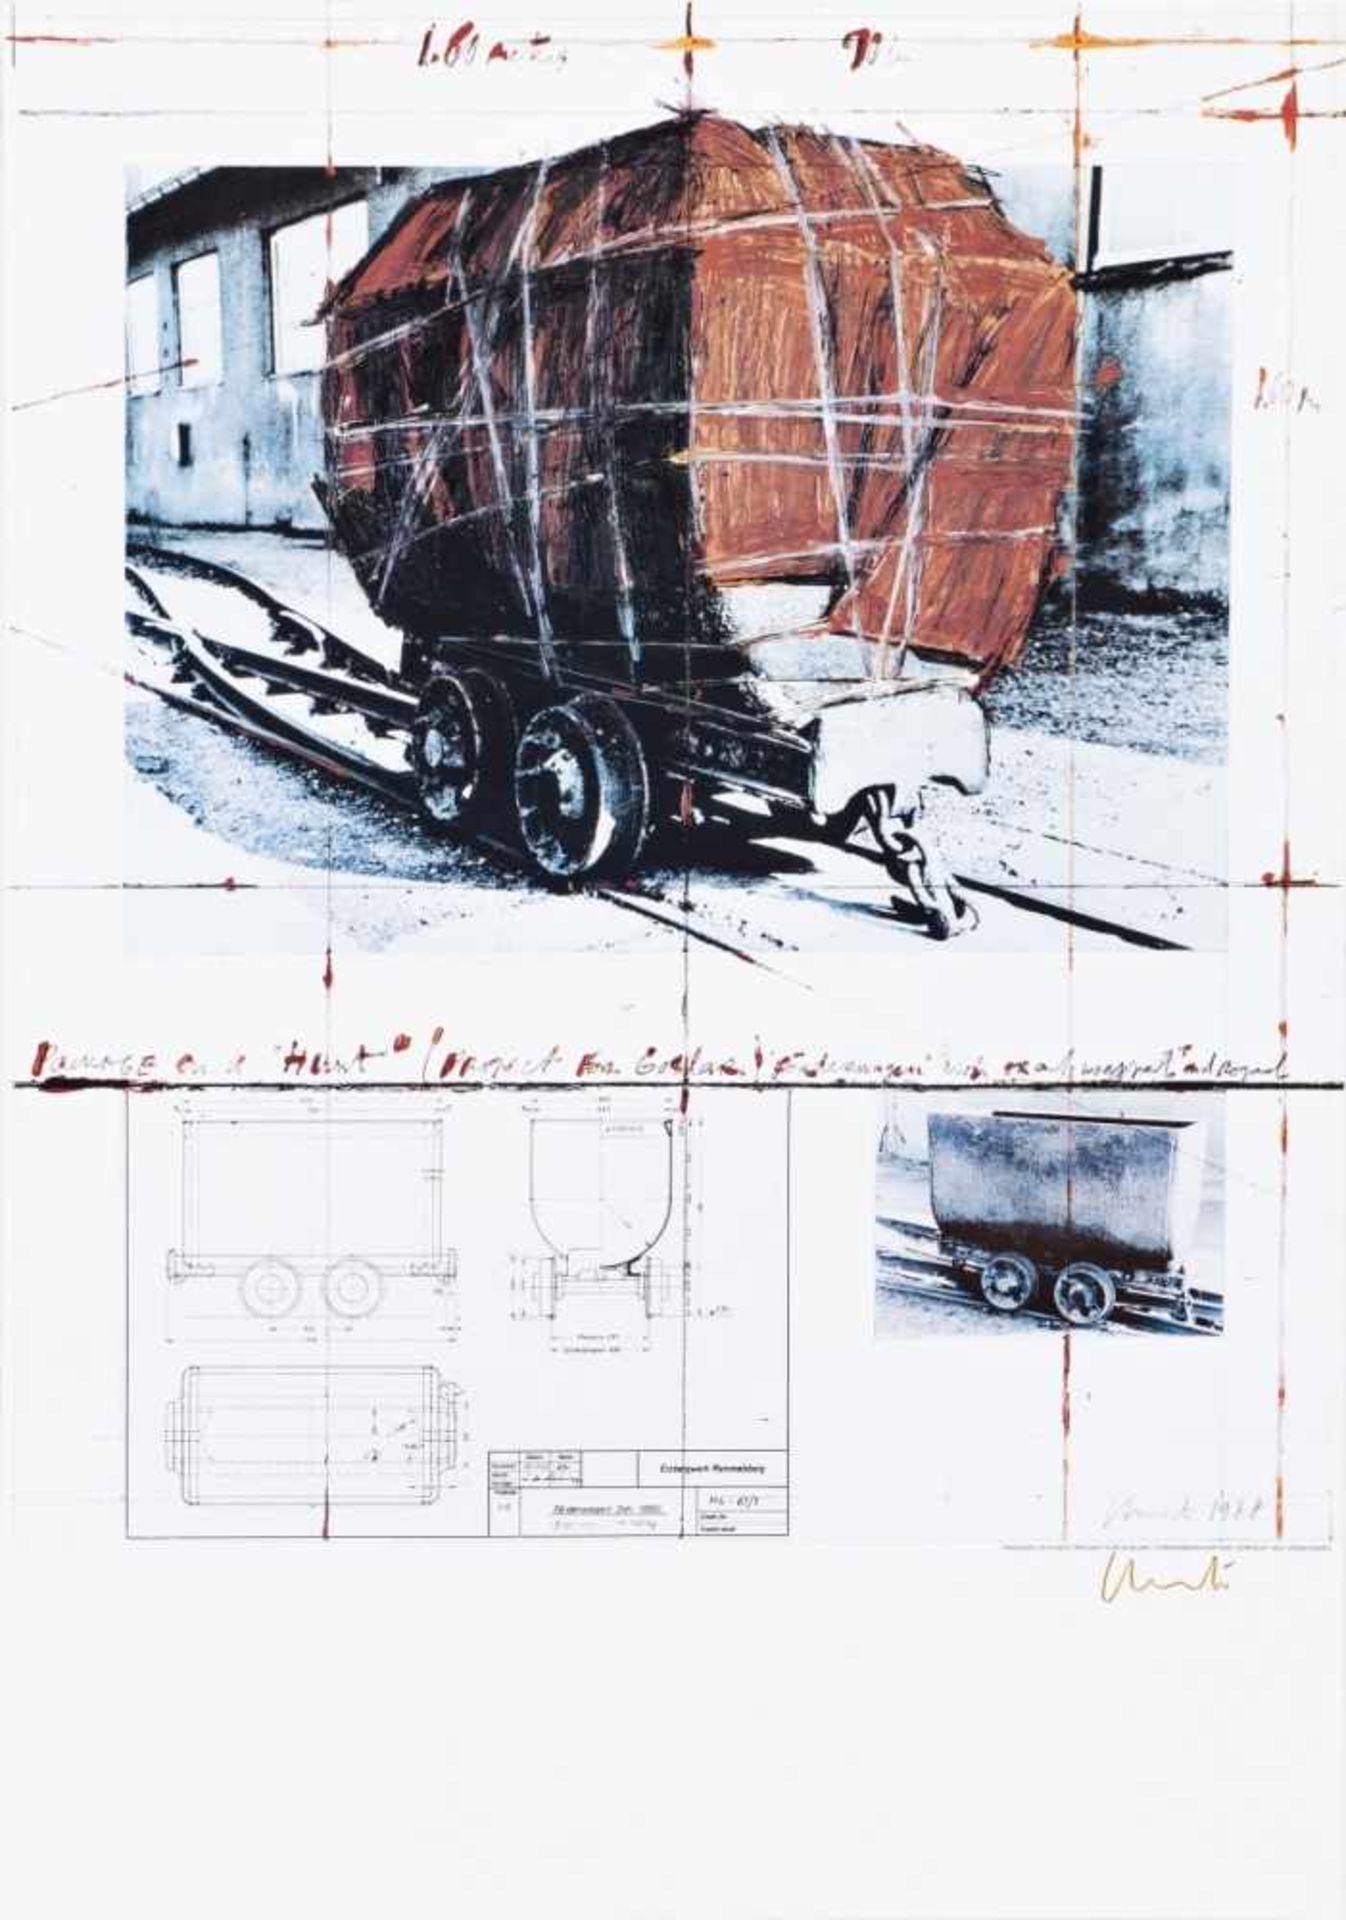 CHRISTO JAVACHEFF(1935 GABROVO)PACKAGE ON A HUNT, 1988Farblithografie auf festem Kartonpapier, 100 x